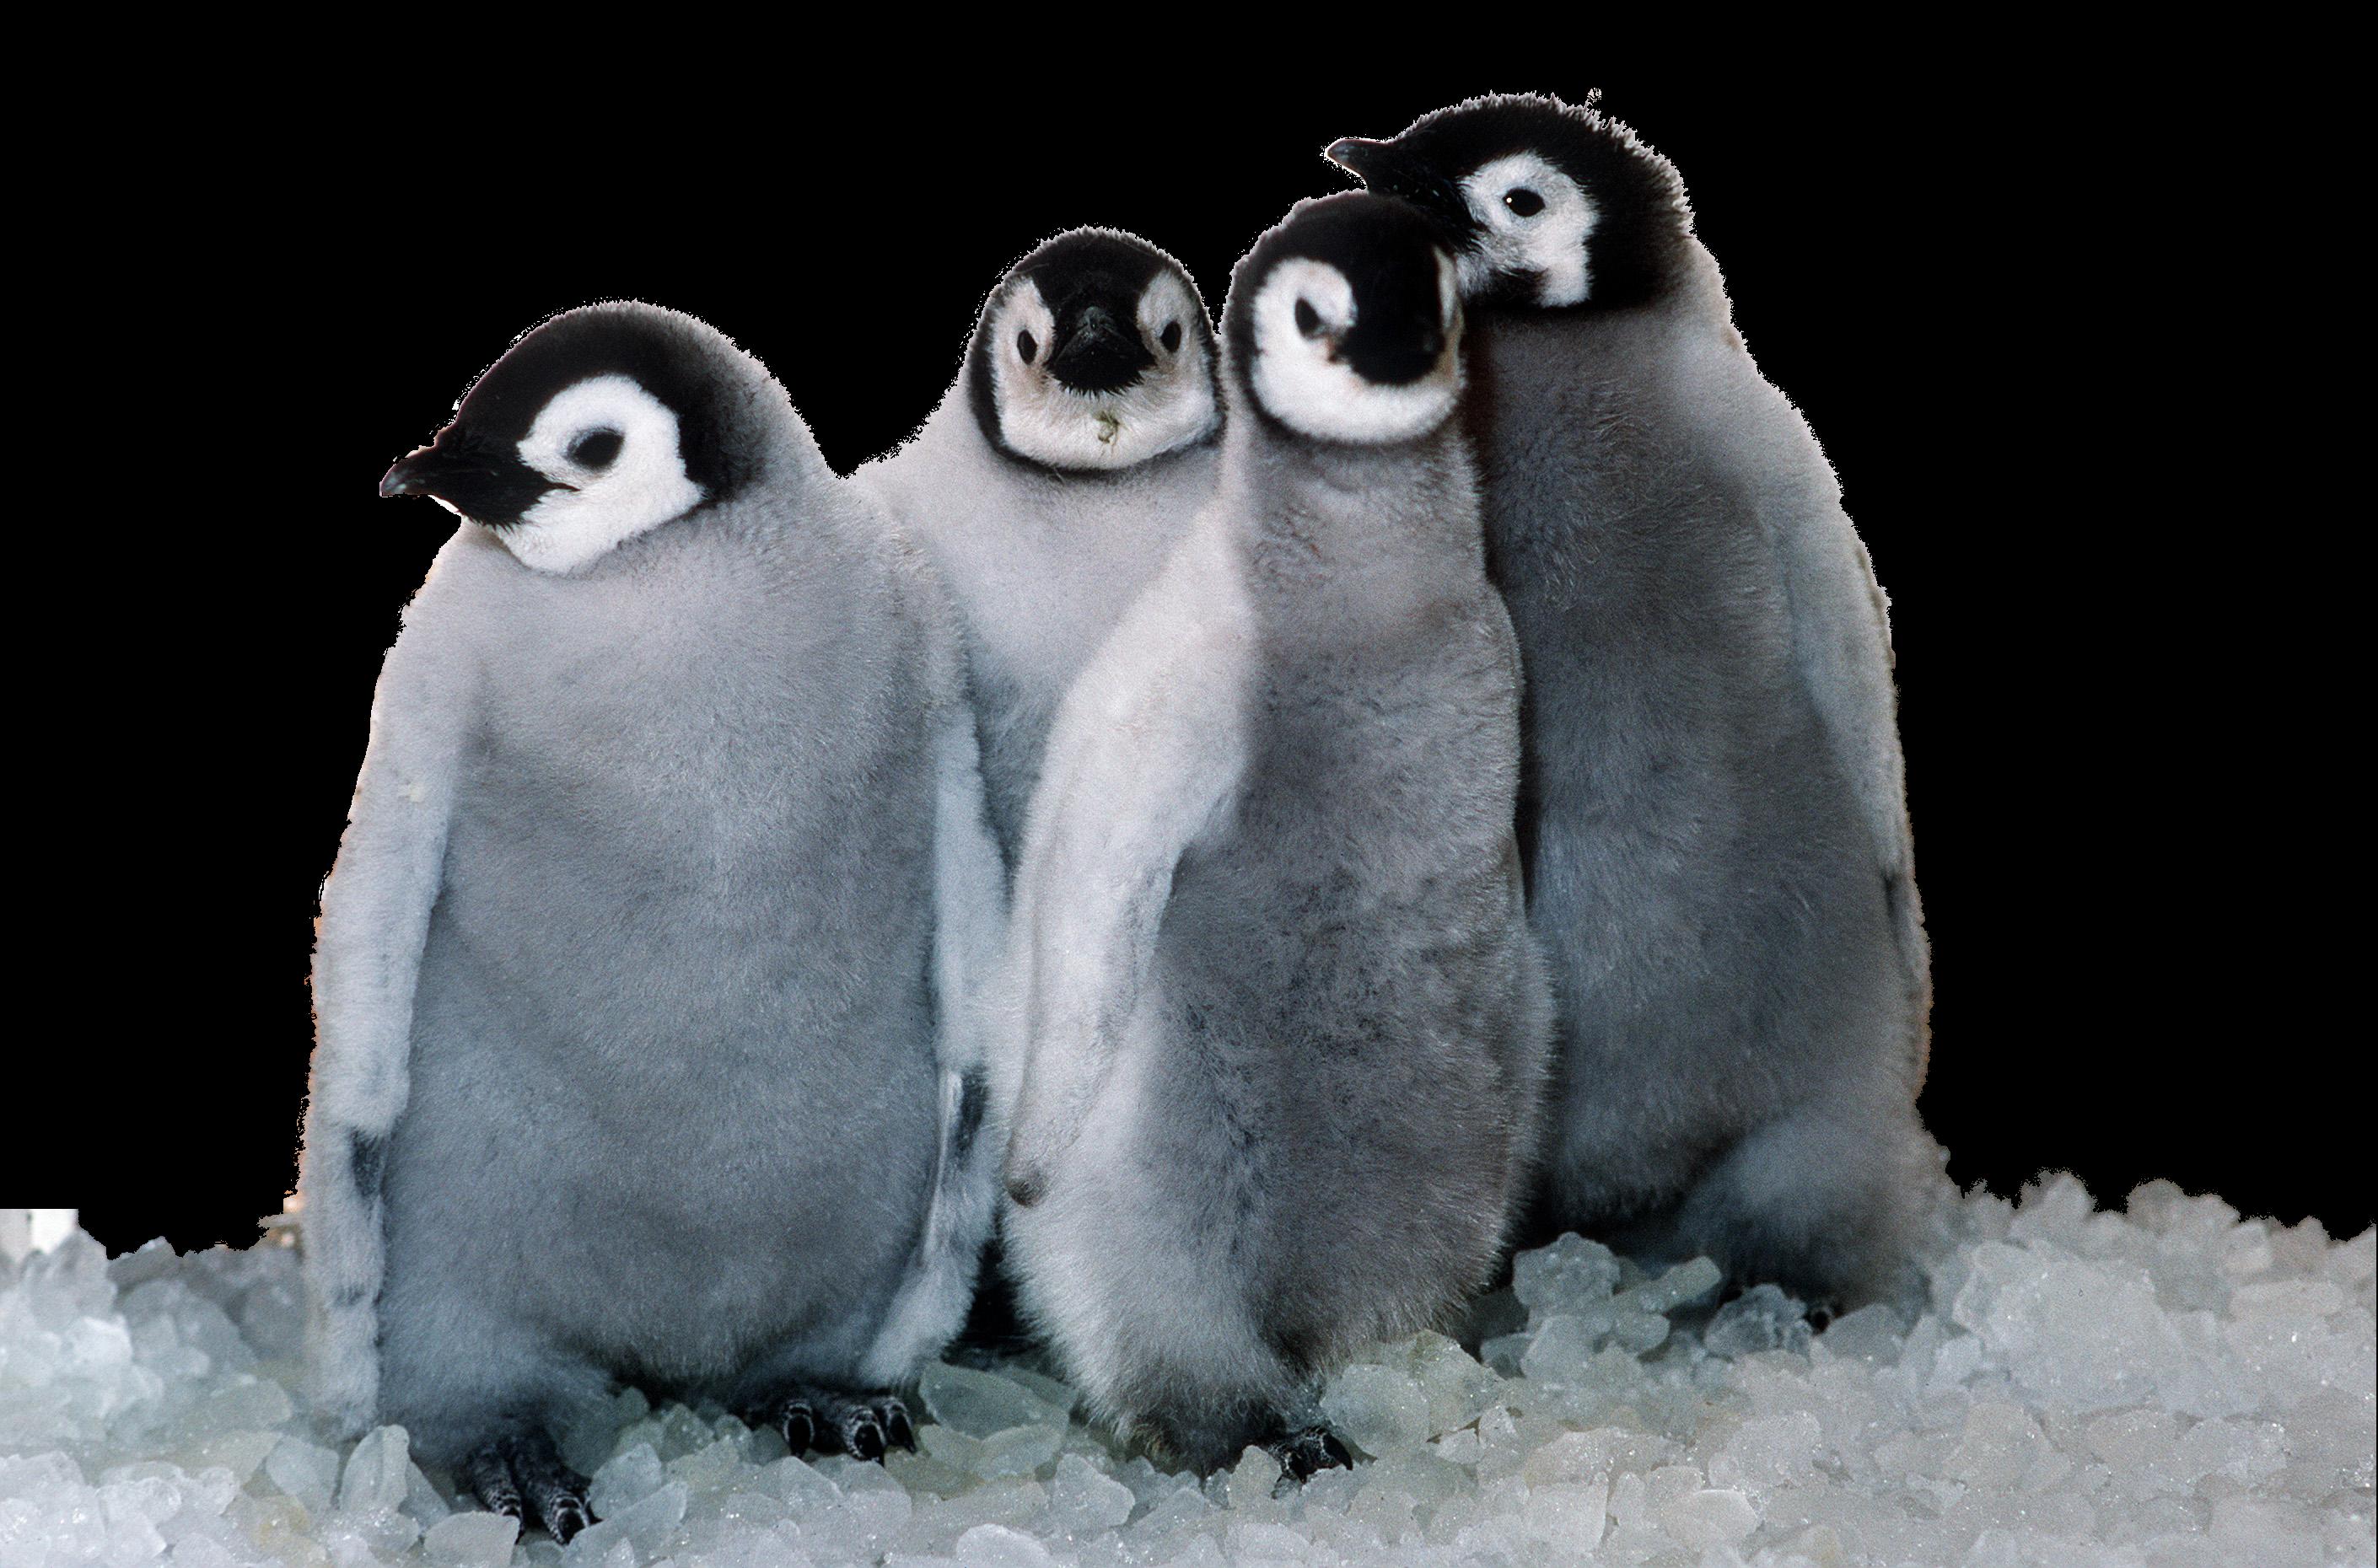 Penguin HD PNG - 92444